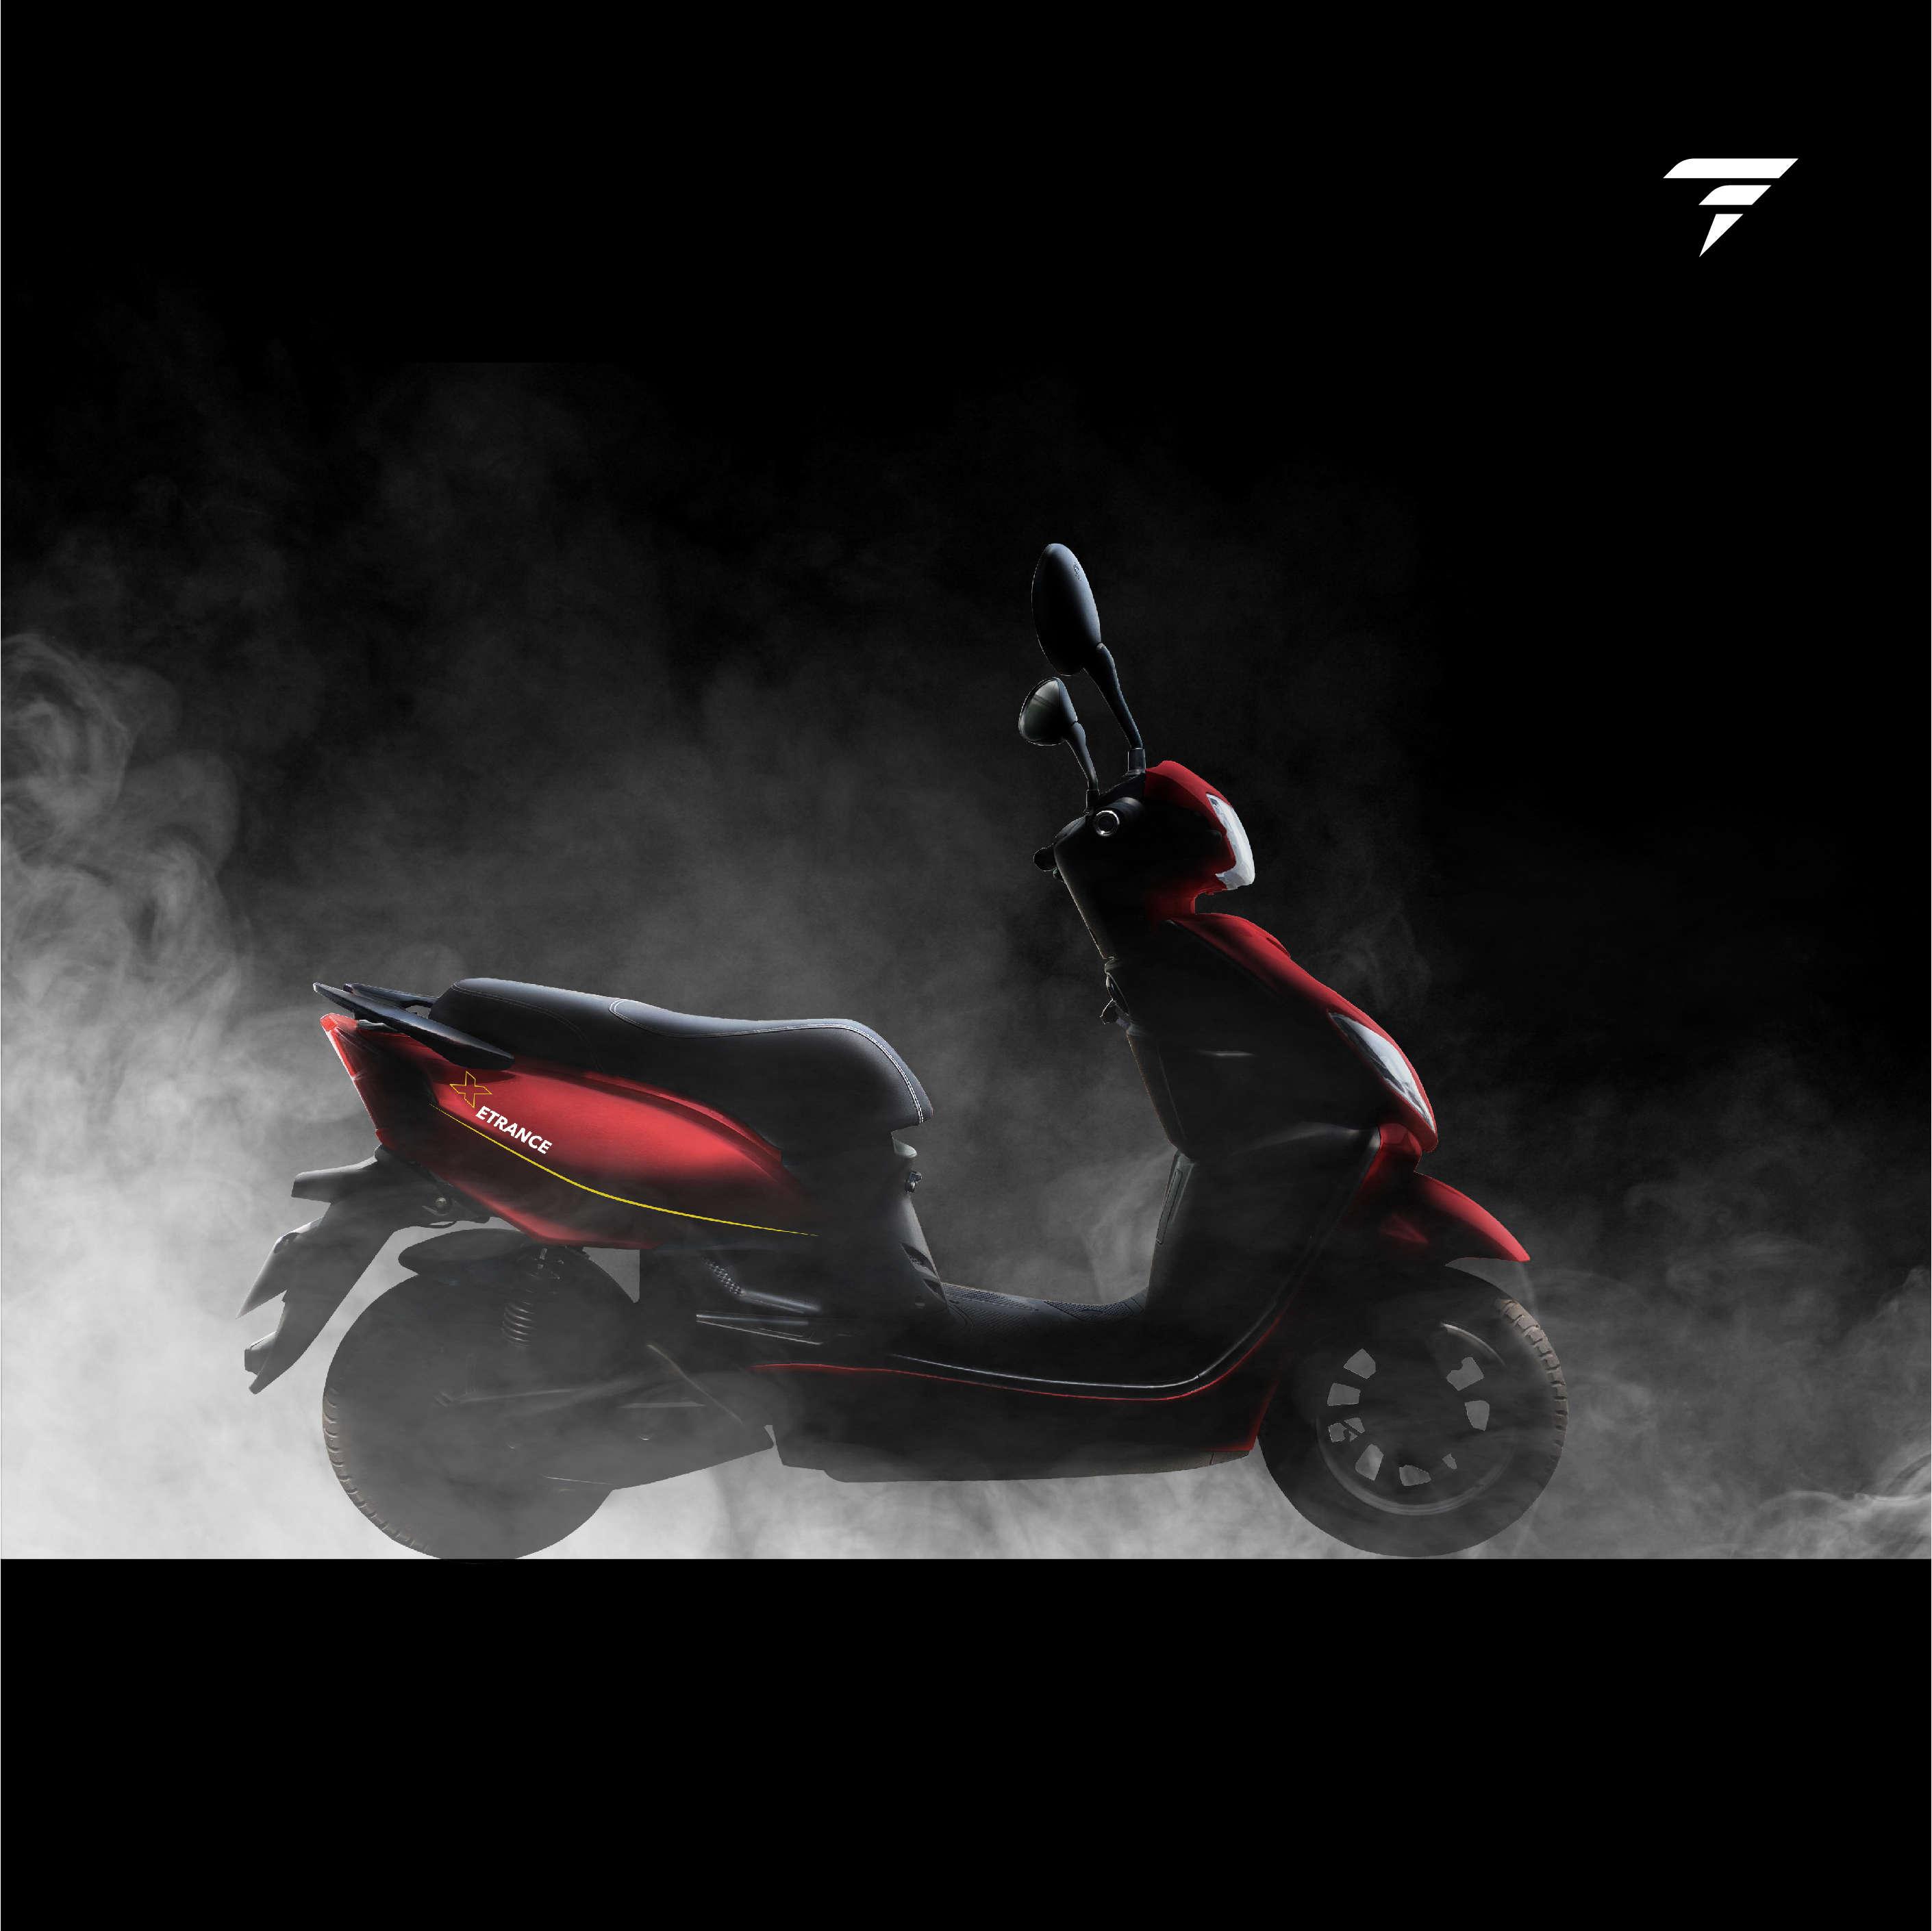 Pure Ev Pure Ev Launches Etrance E Scooter Priced At Rs 56 999 Auto News Et Auto